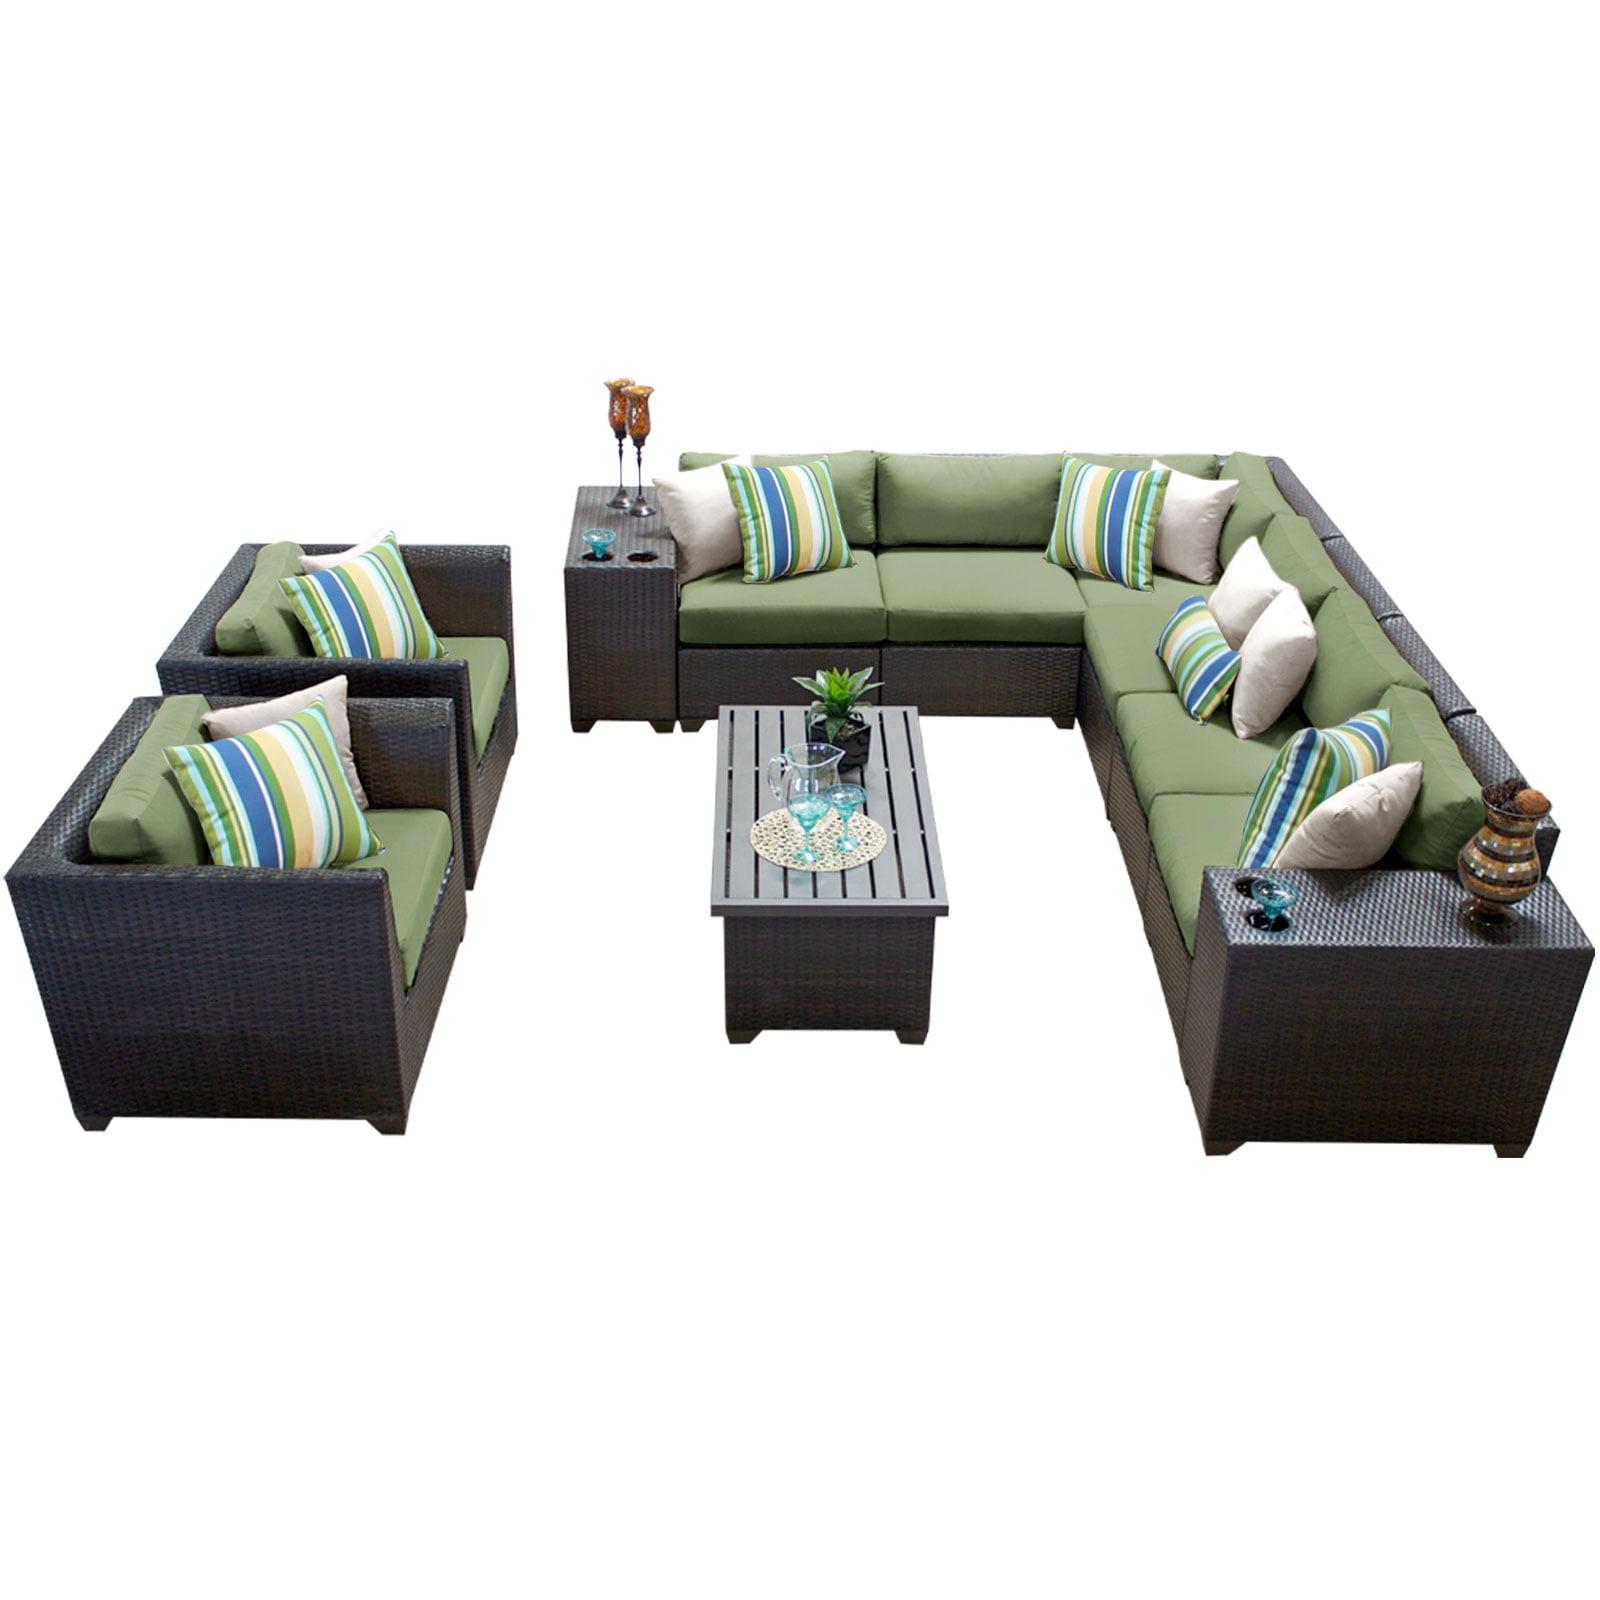 Bermuda 11 Piece Outdoor Wicker Patio Furniture Set 11d by TK Classics